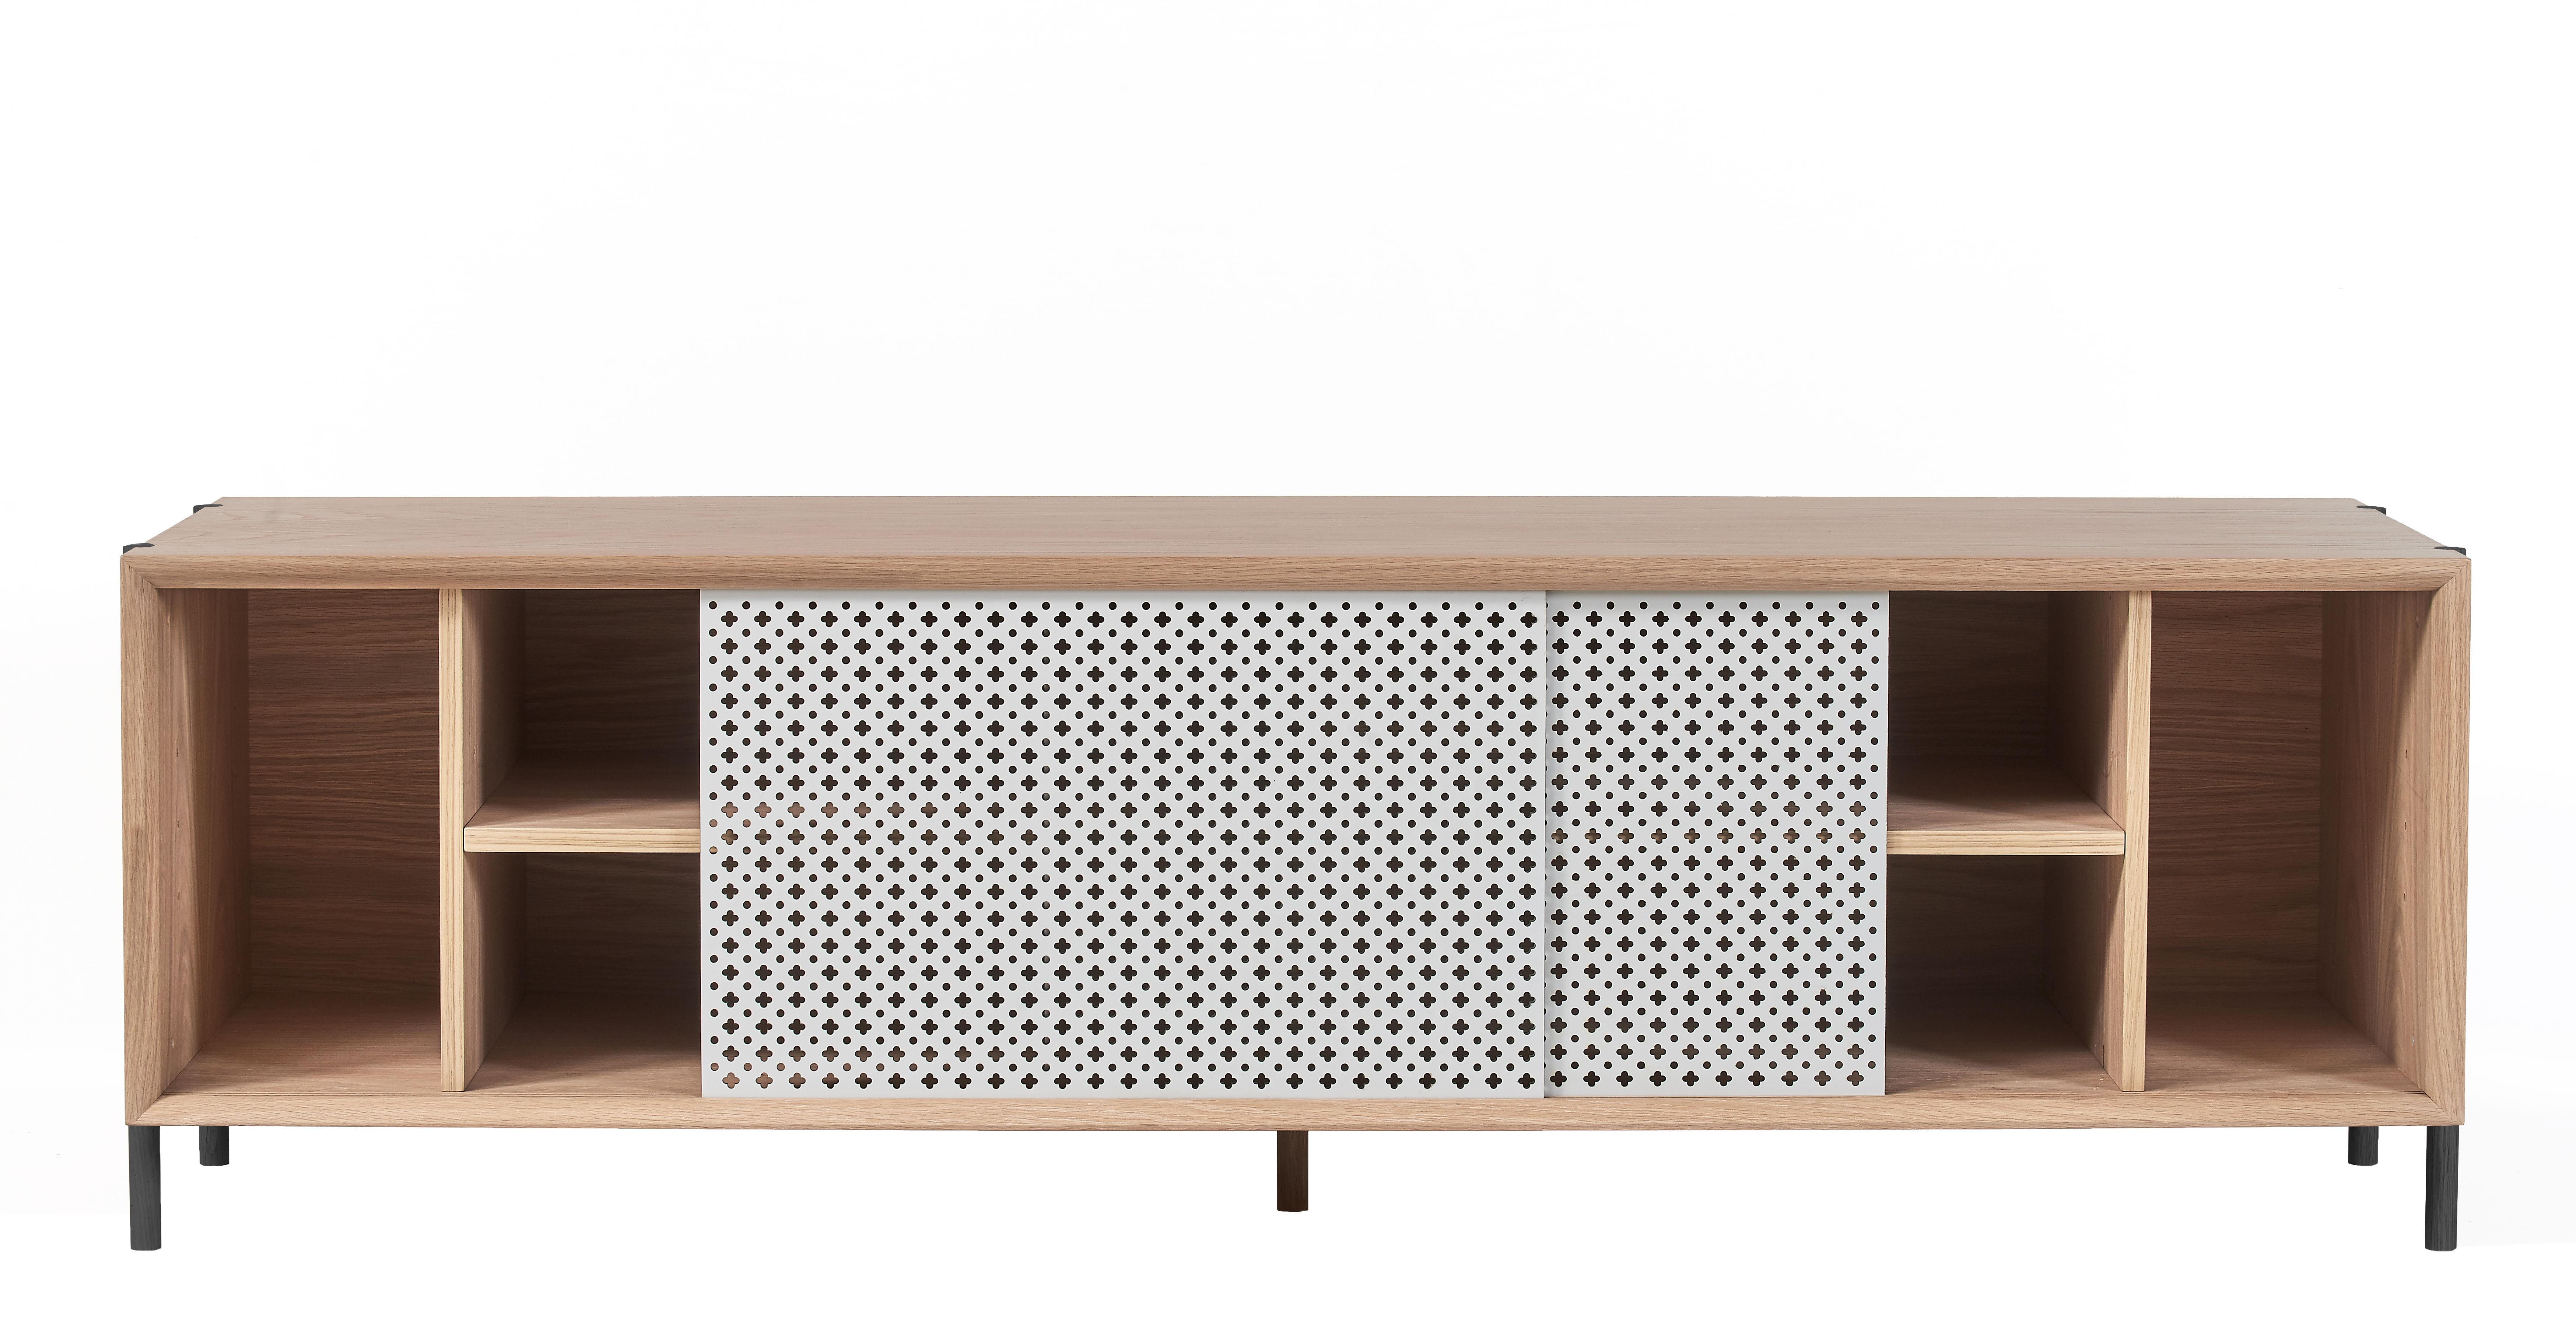 buffet gabin meuble tv l 162 ch ne m tal gris clair ch ne hart made in design. Black Bedroom Furniture Sets. Home Design Ideas